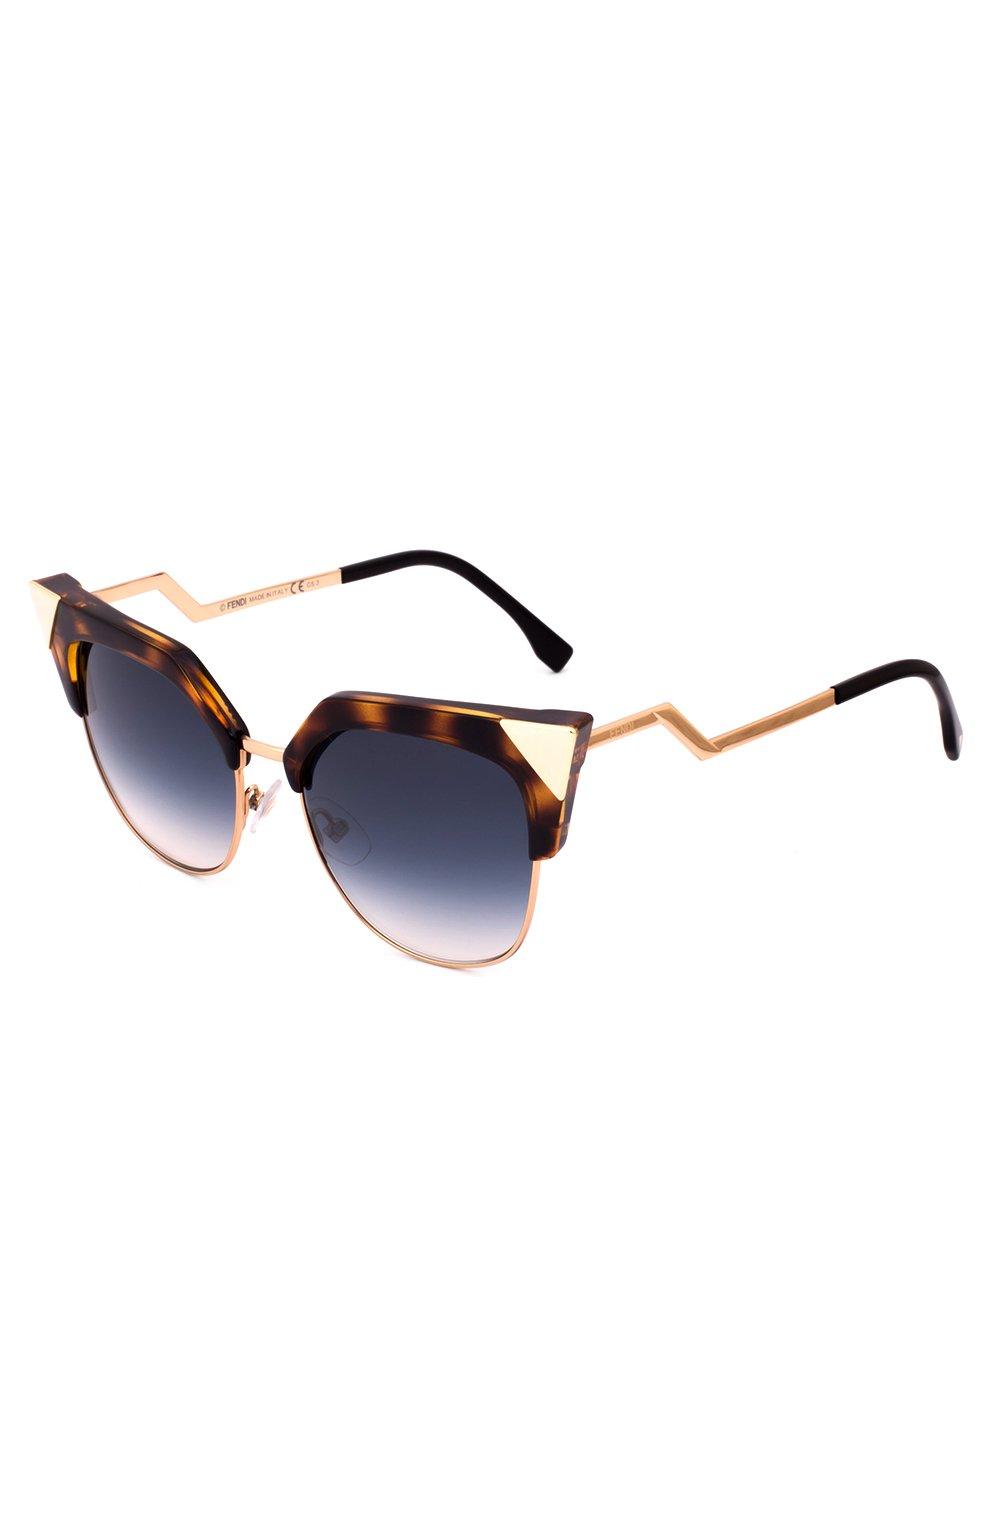 Женские солнцезащитные очки FENDI синего цвета, арт. 0149 TLW   Фото 2